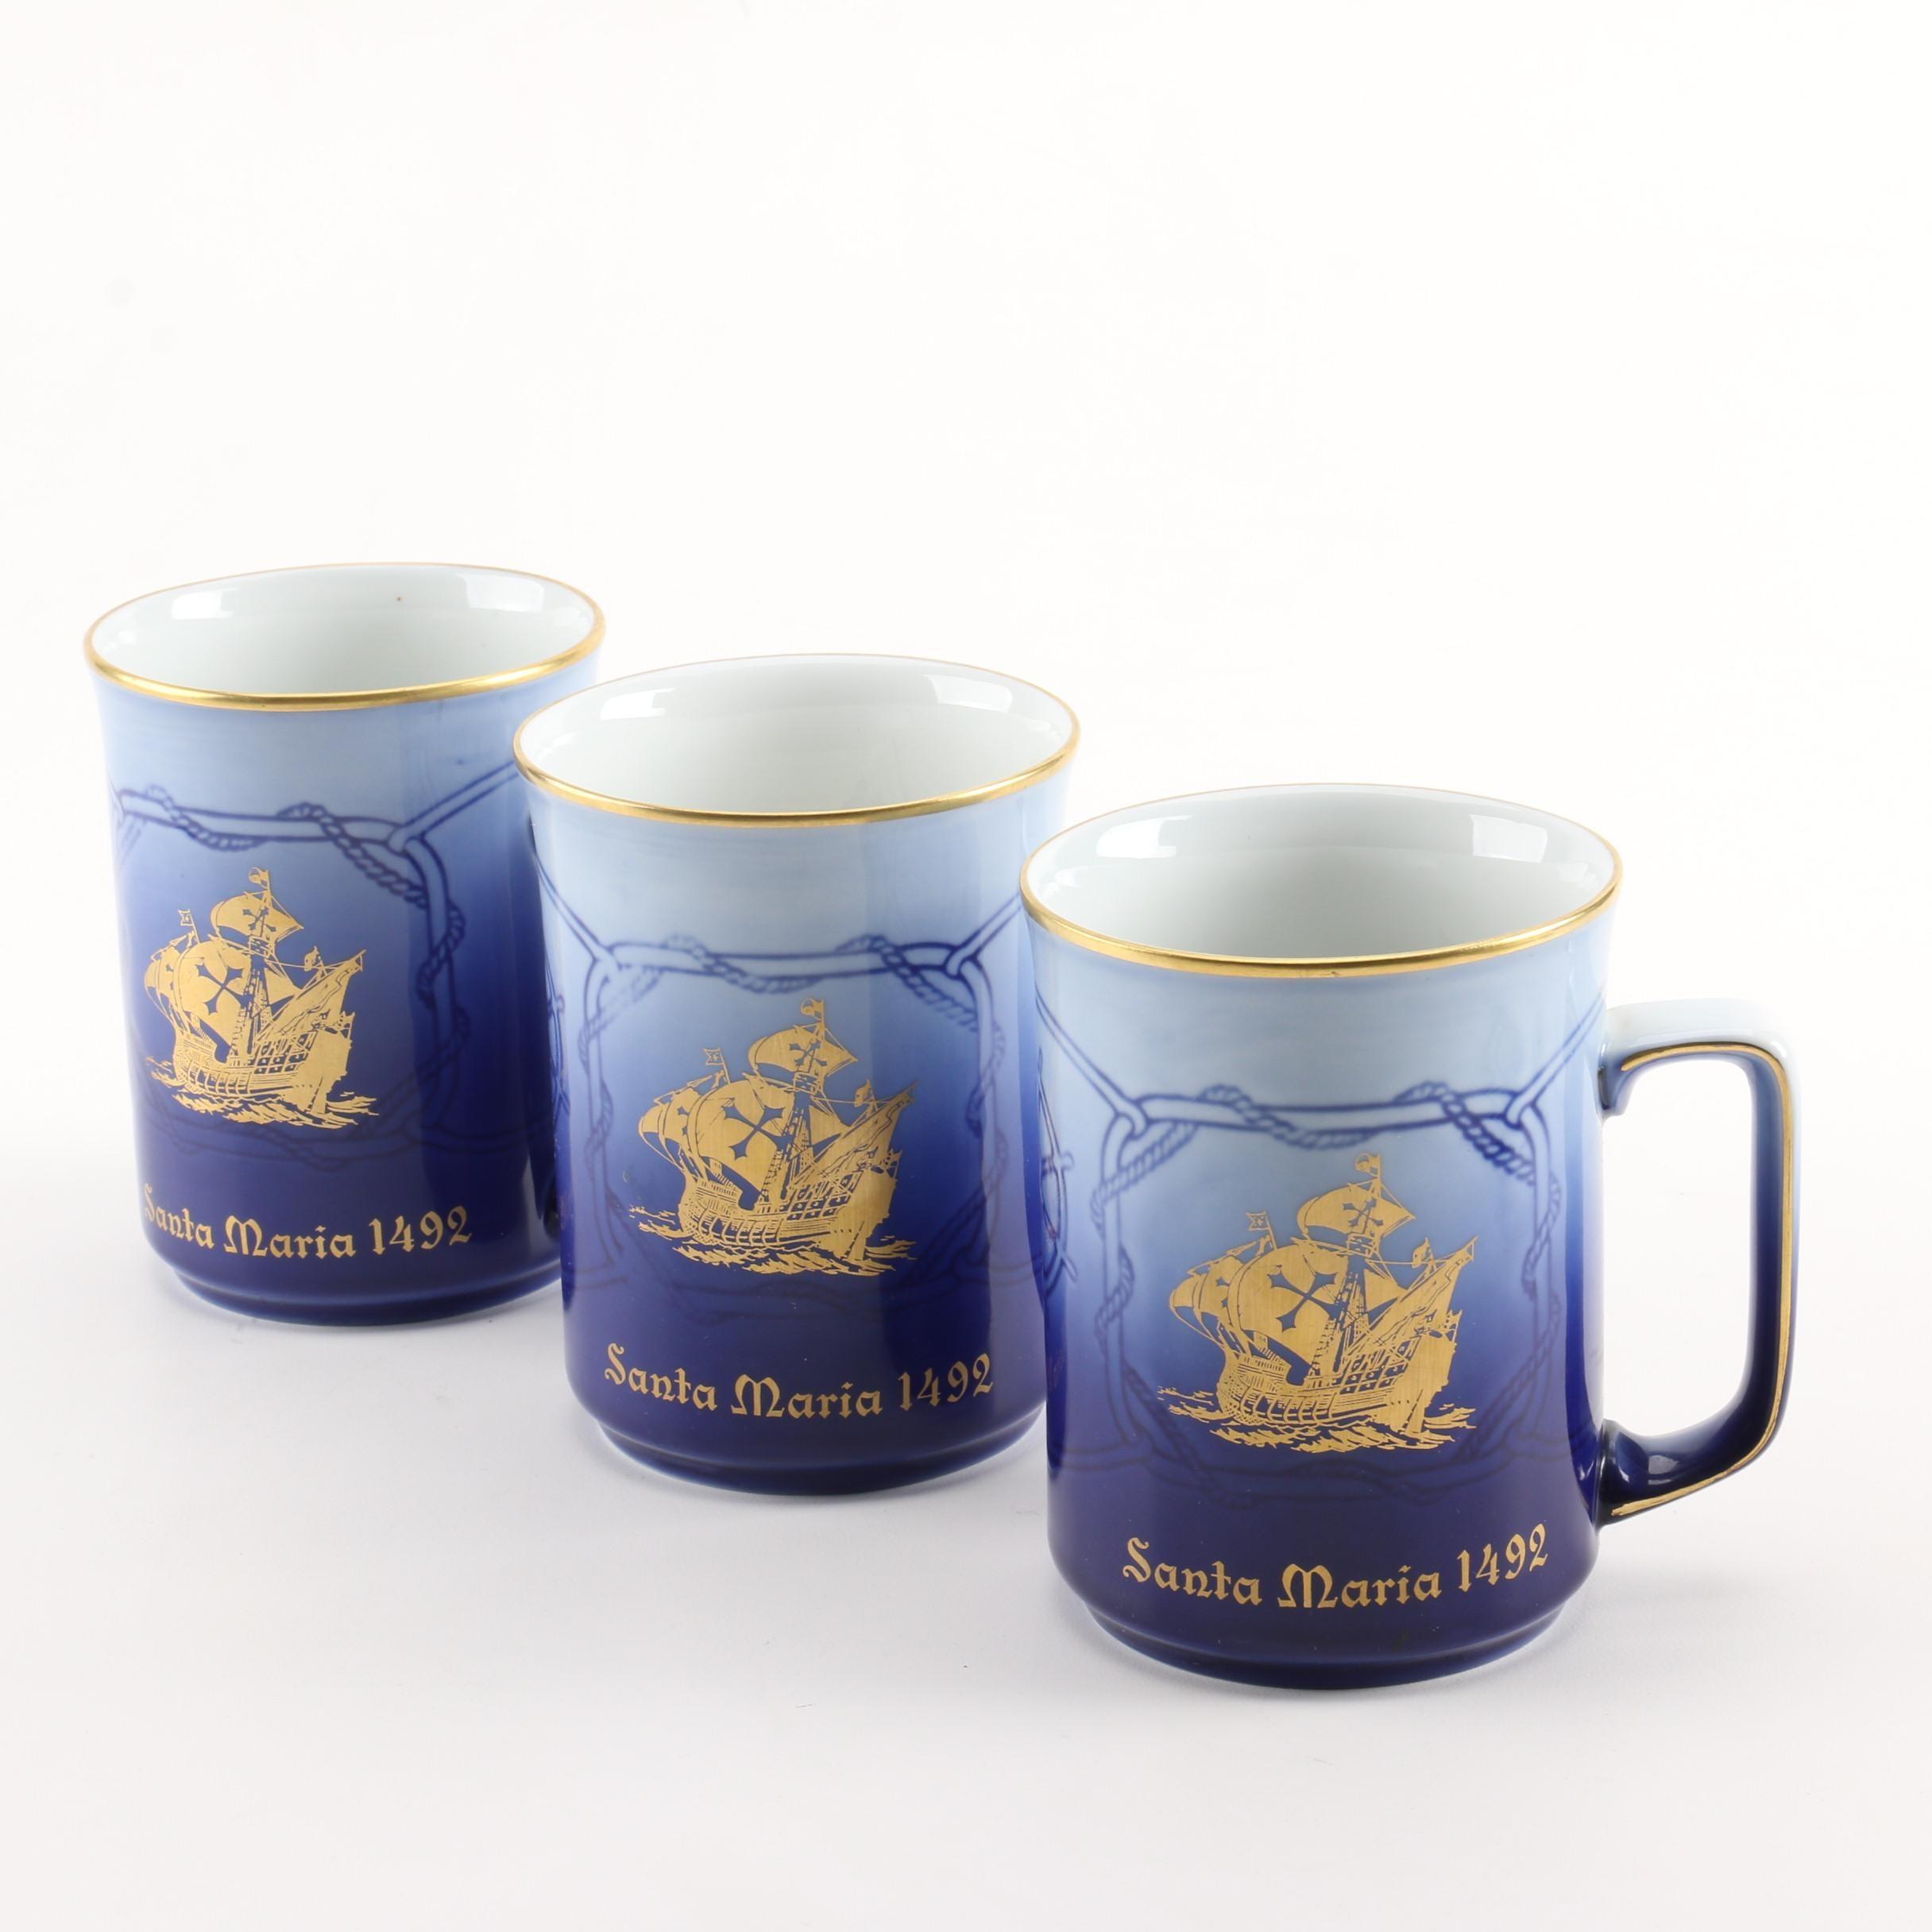 Copenhagen Porcelain Collectible Mugs